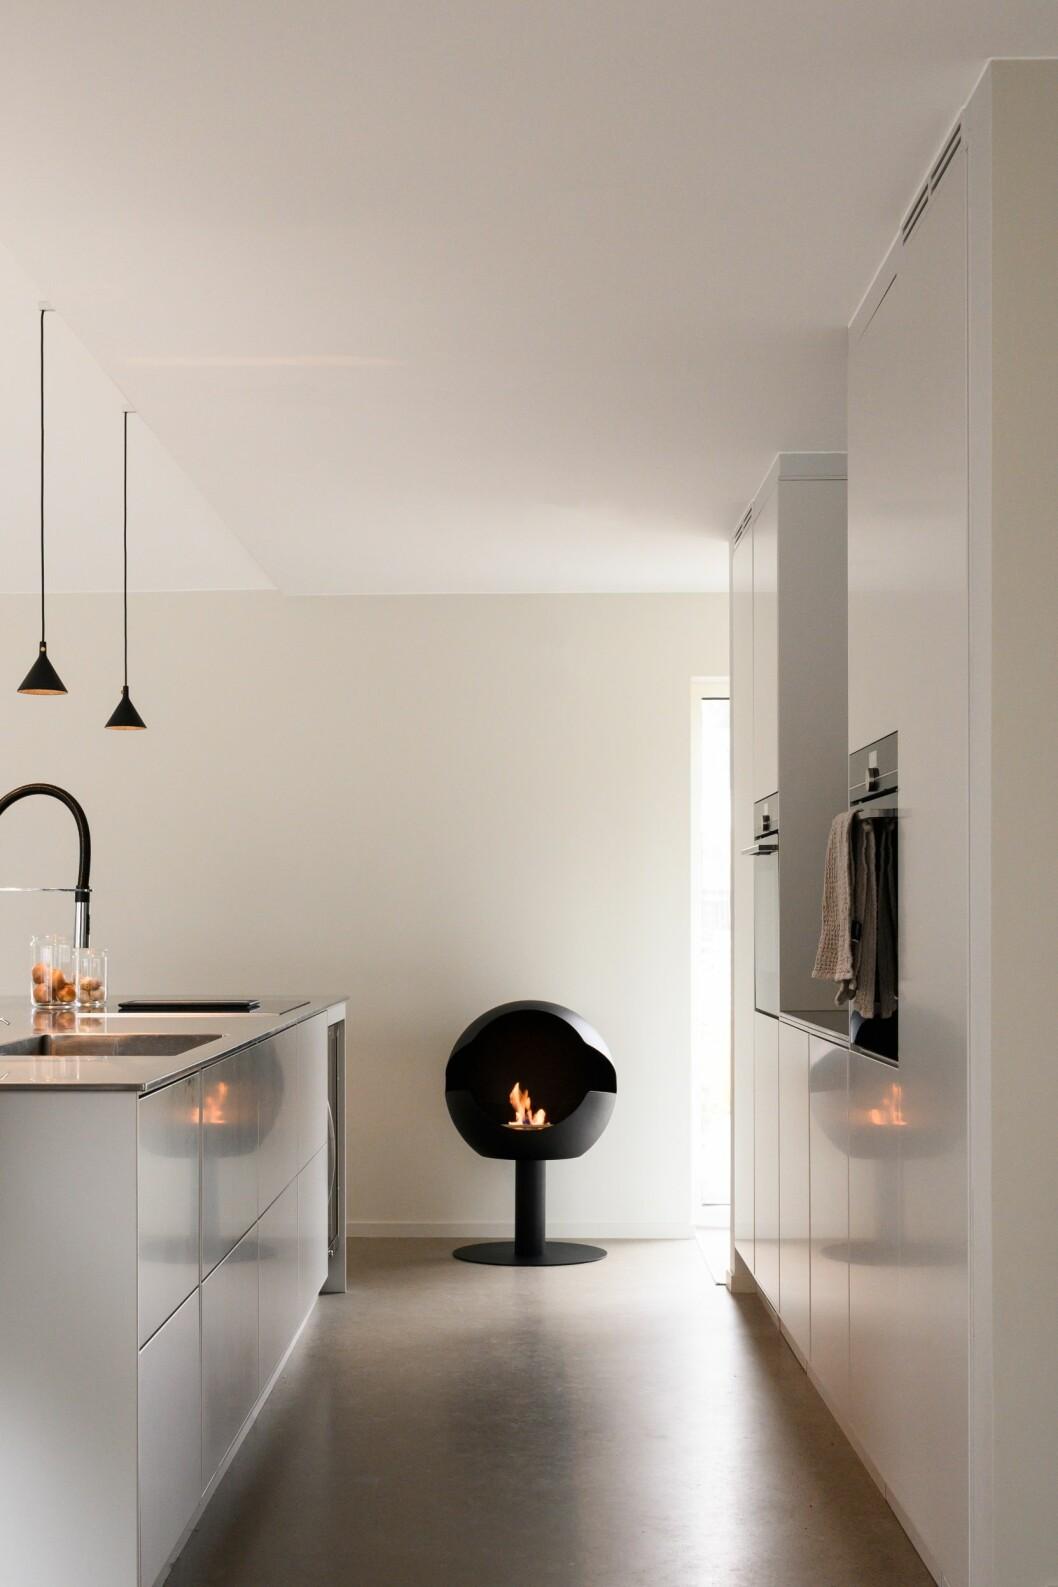 Fristående eldstad, Globe hög fot, svart, insatssten Mystic Sand, pris 27 900 kr, Vauni